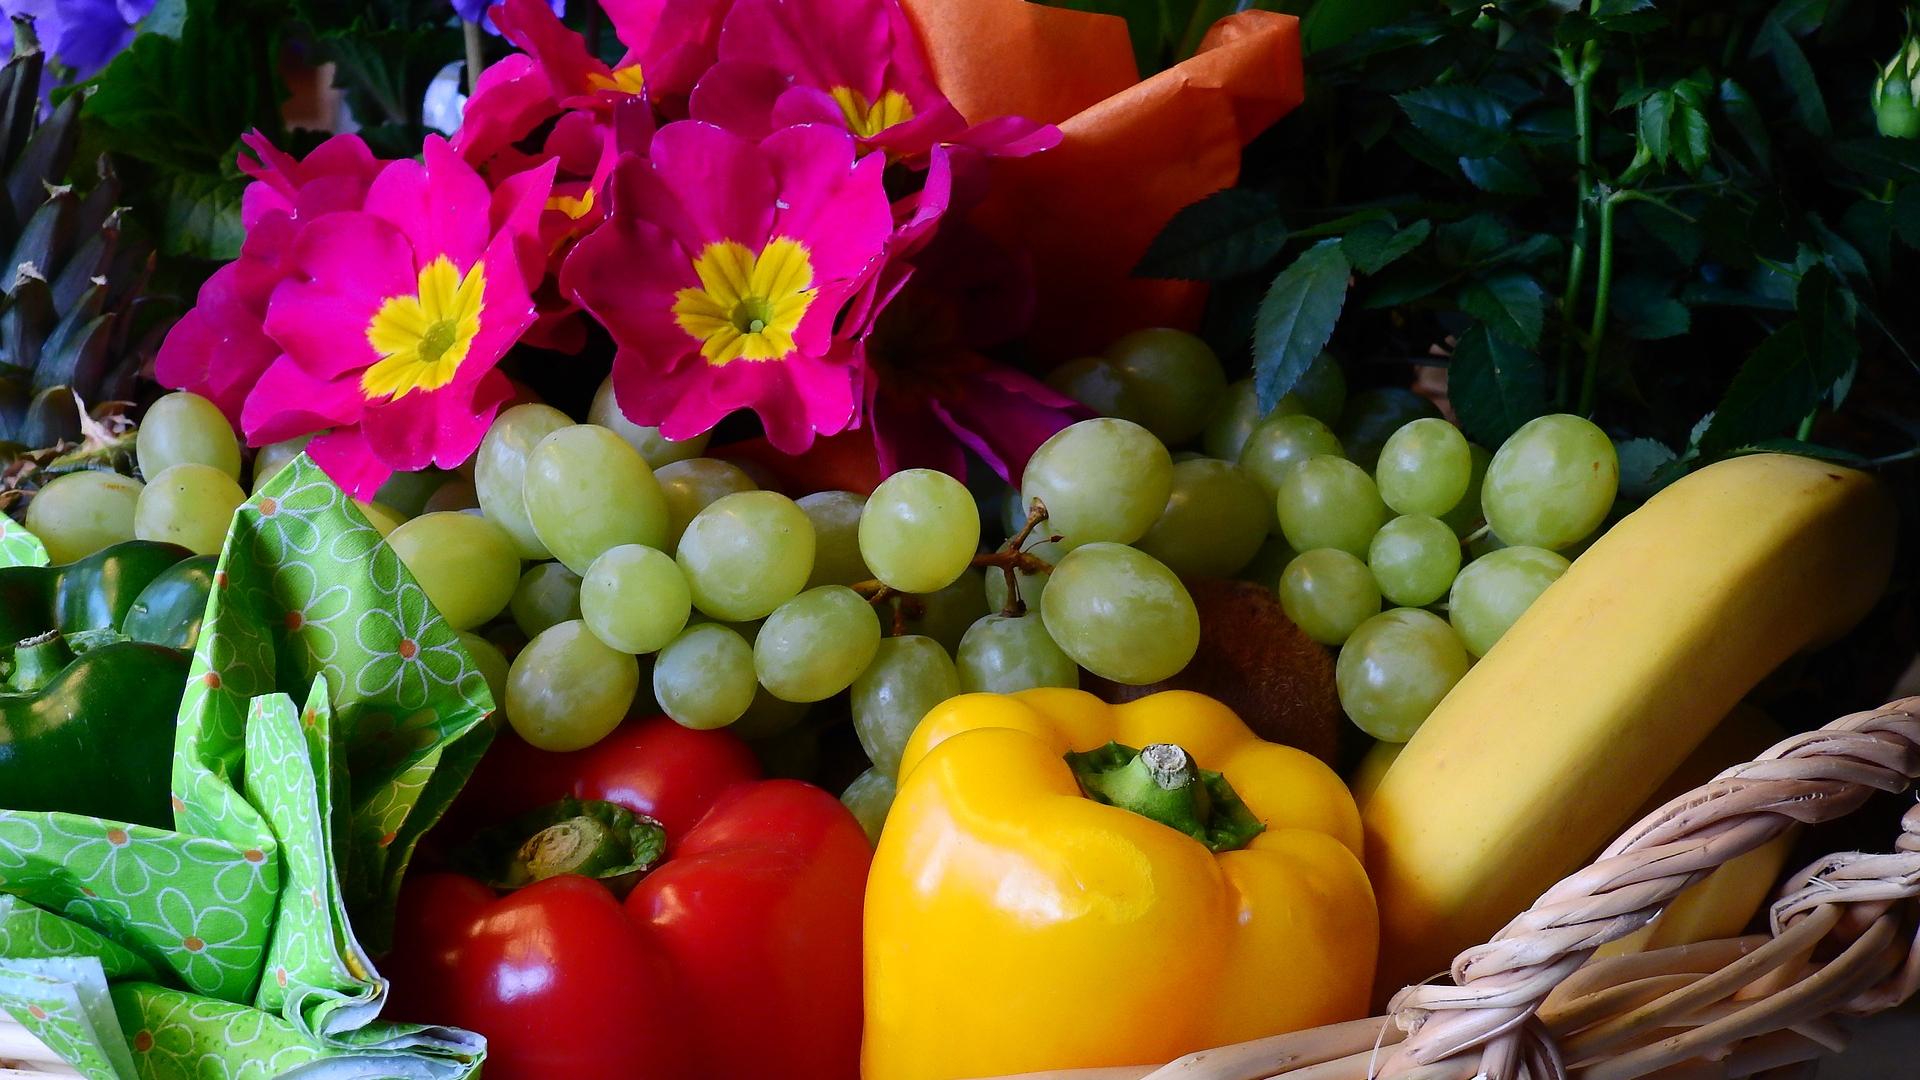 download 1920x1080 wallpaper vegetables, fruits, paprika, banana